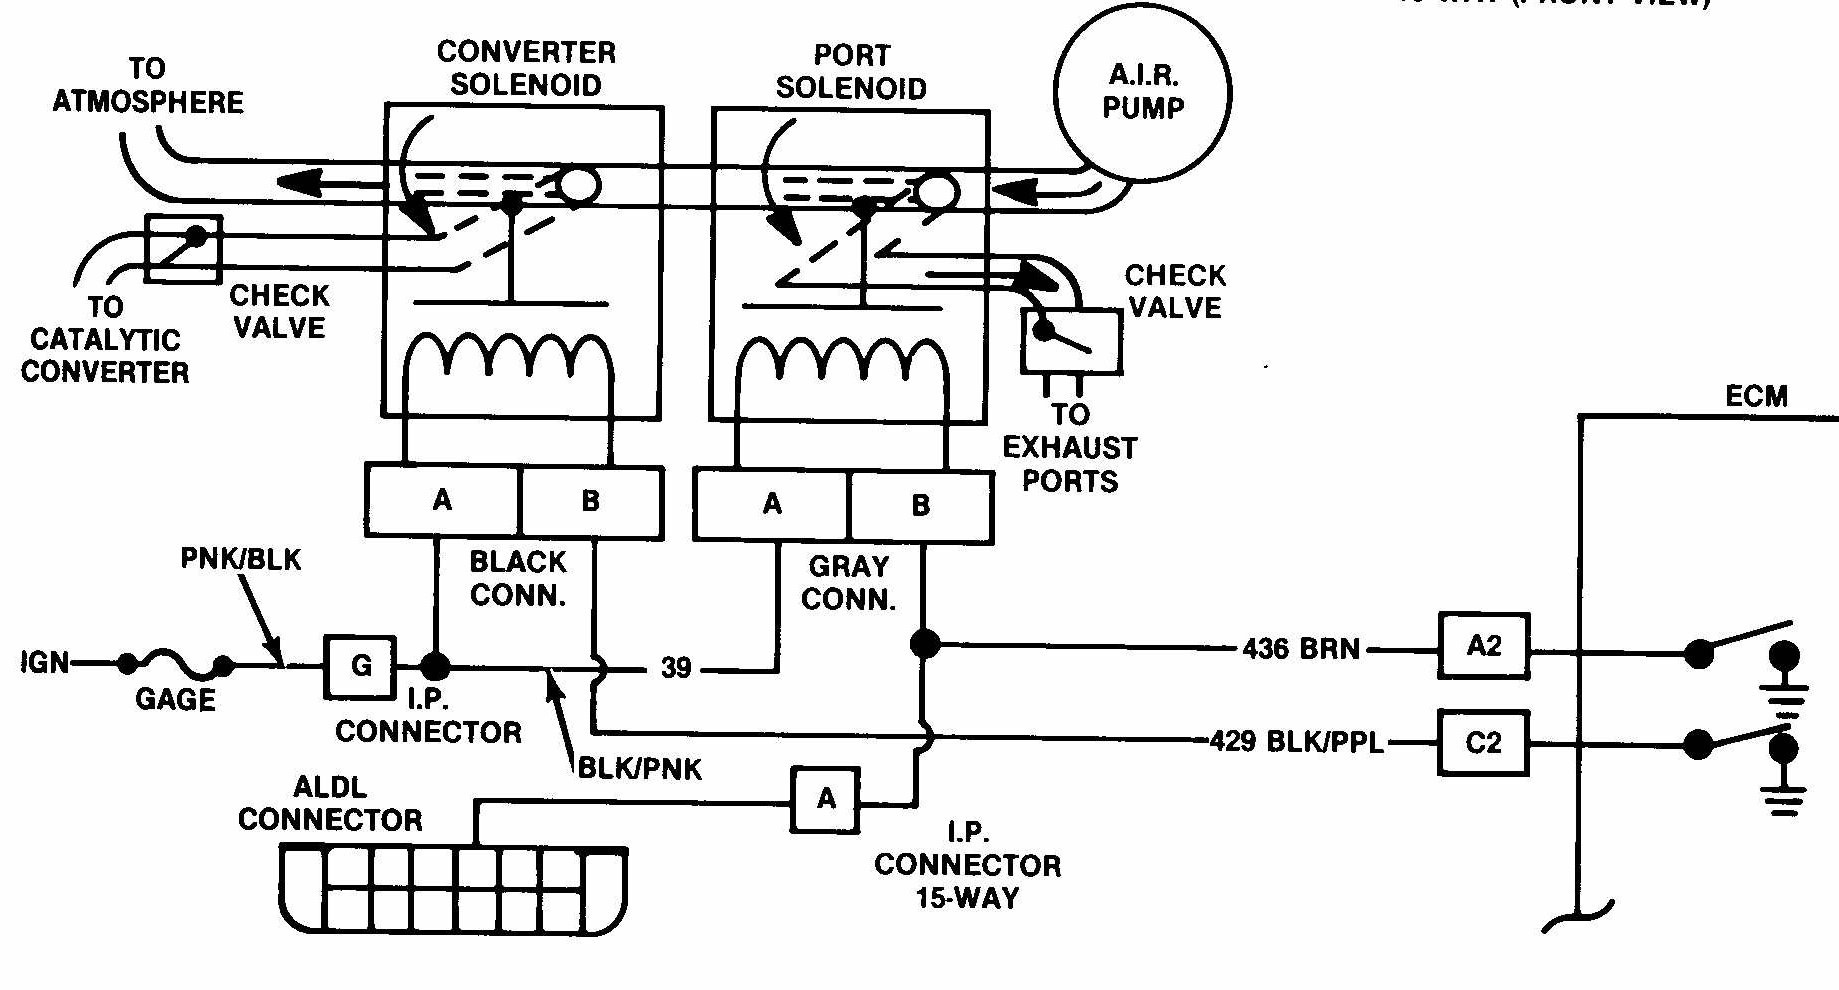 AIR smog pump electrical diagram JPG